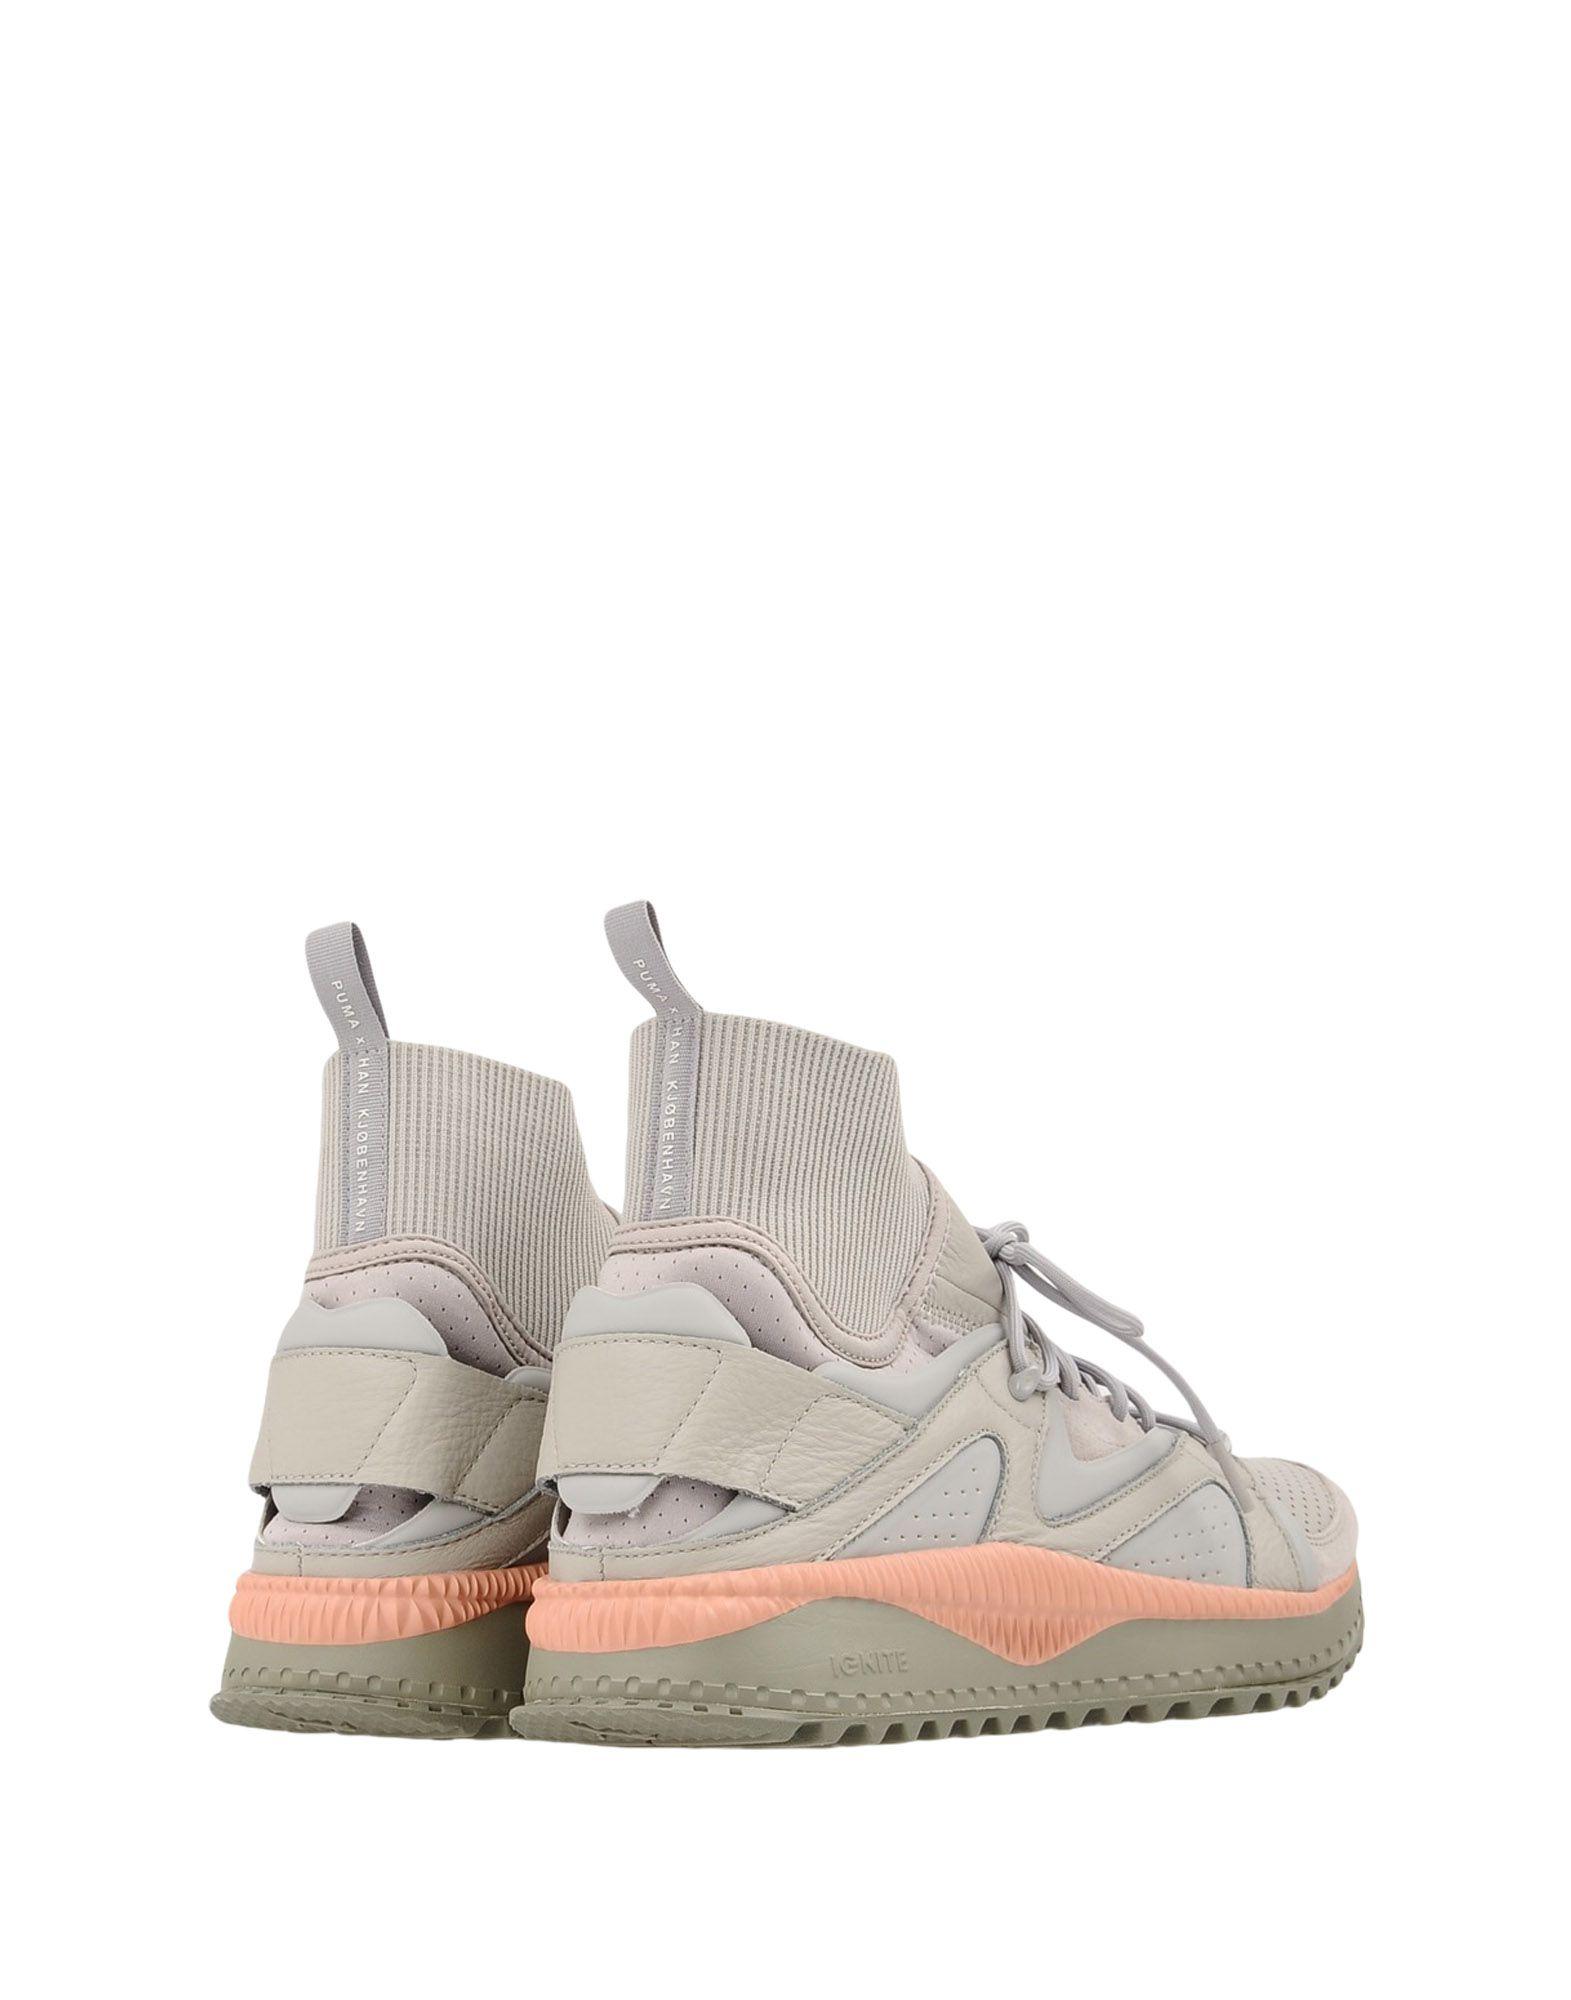 Rabatt echte Schuhe Puma X Han Kjøbenhavn  B.O.G Tsugi Snkb  11379818CB